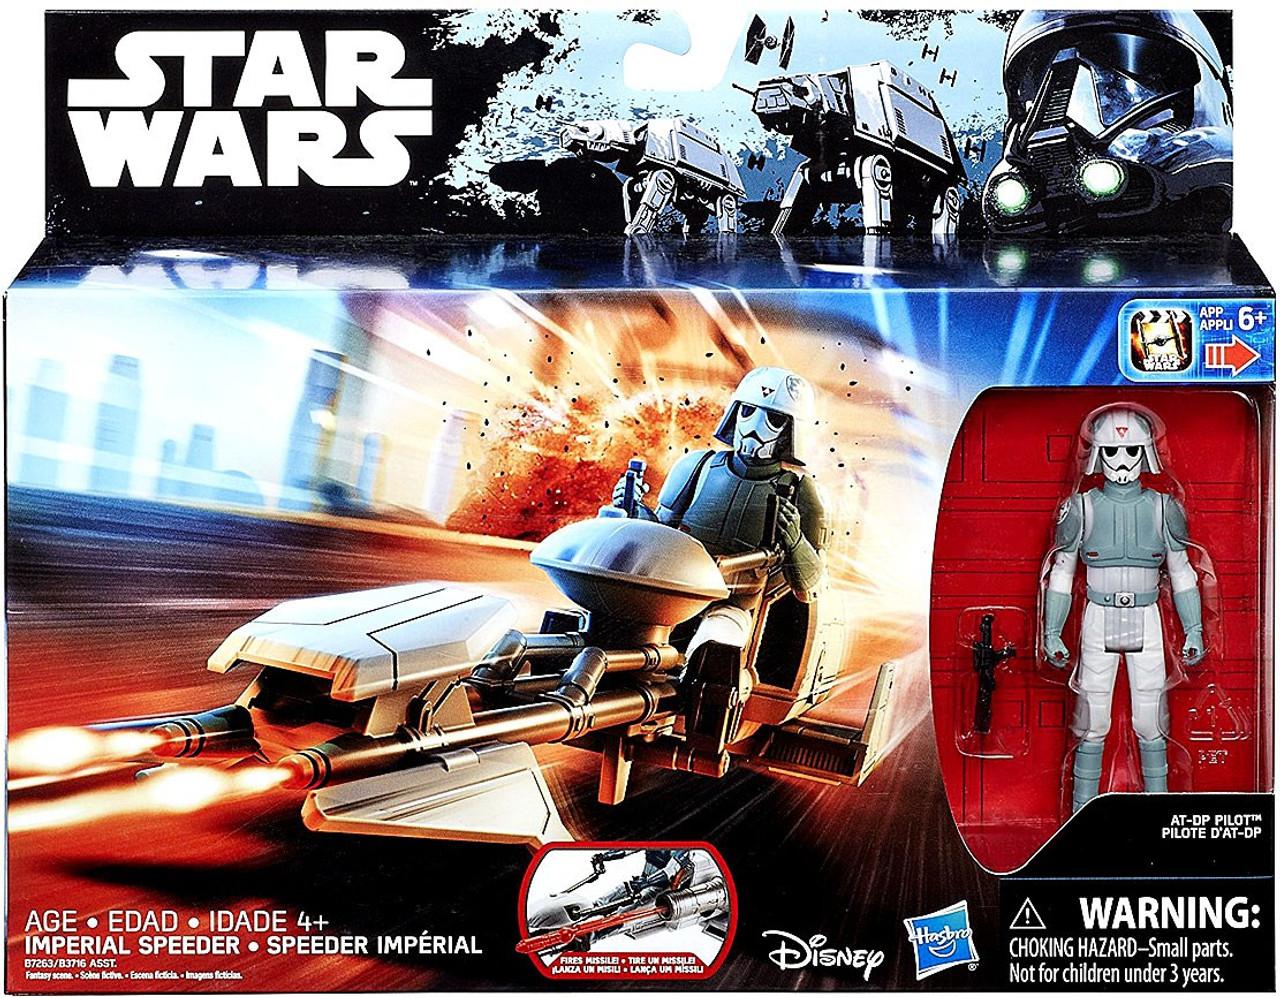 Imperial Speeder with AT-DP Pilot Rebels Star Wars